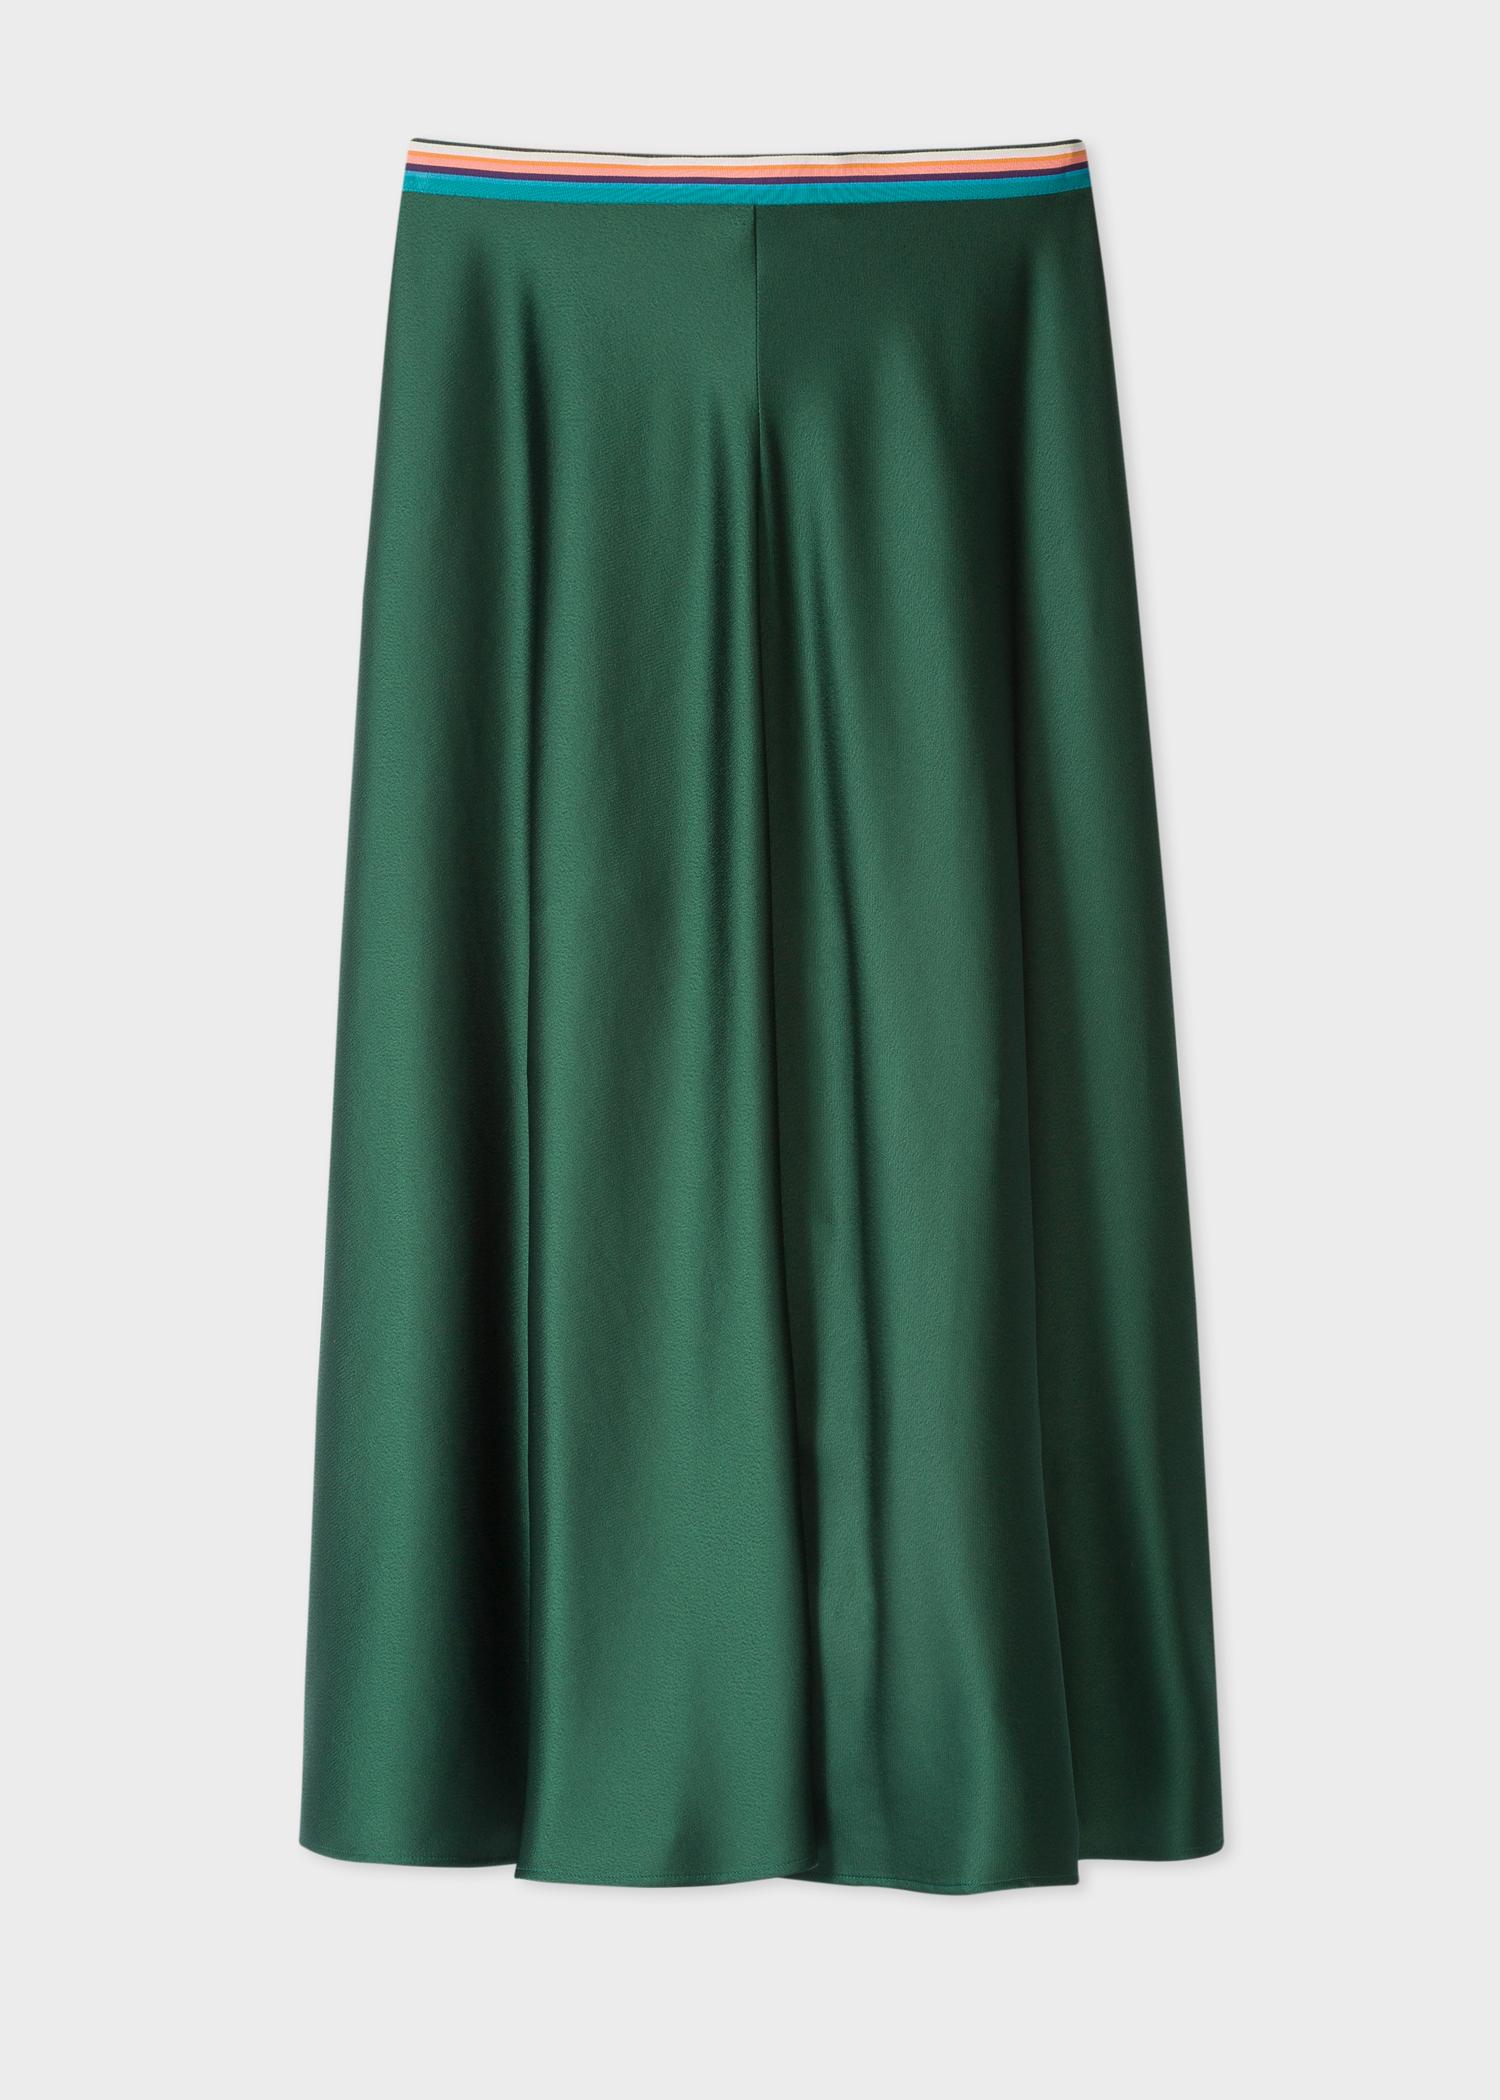 7c34bd9cdfac Front View - Women's Dark Green Midi Skirt Paul Smith